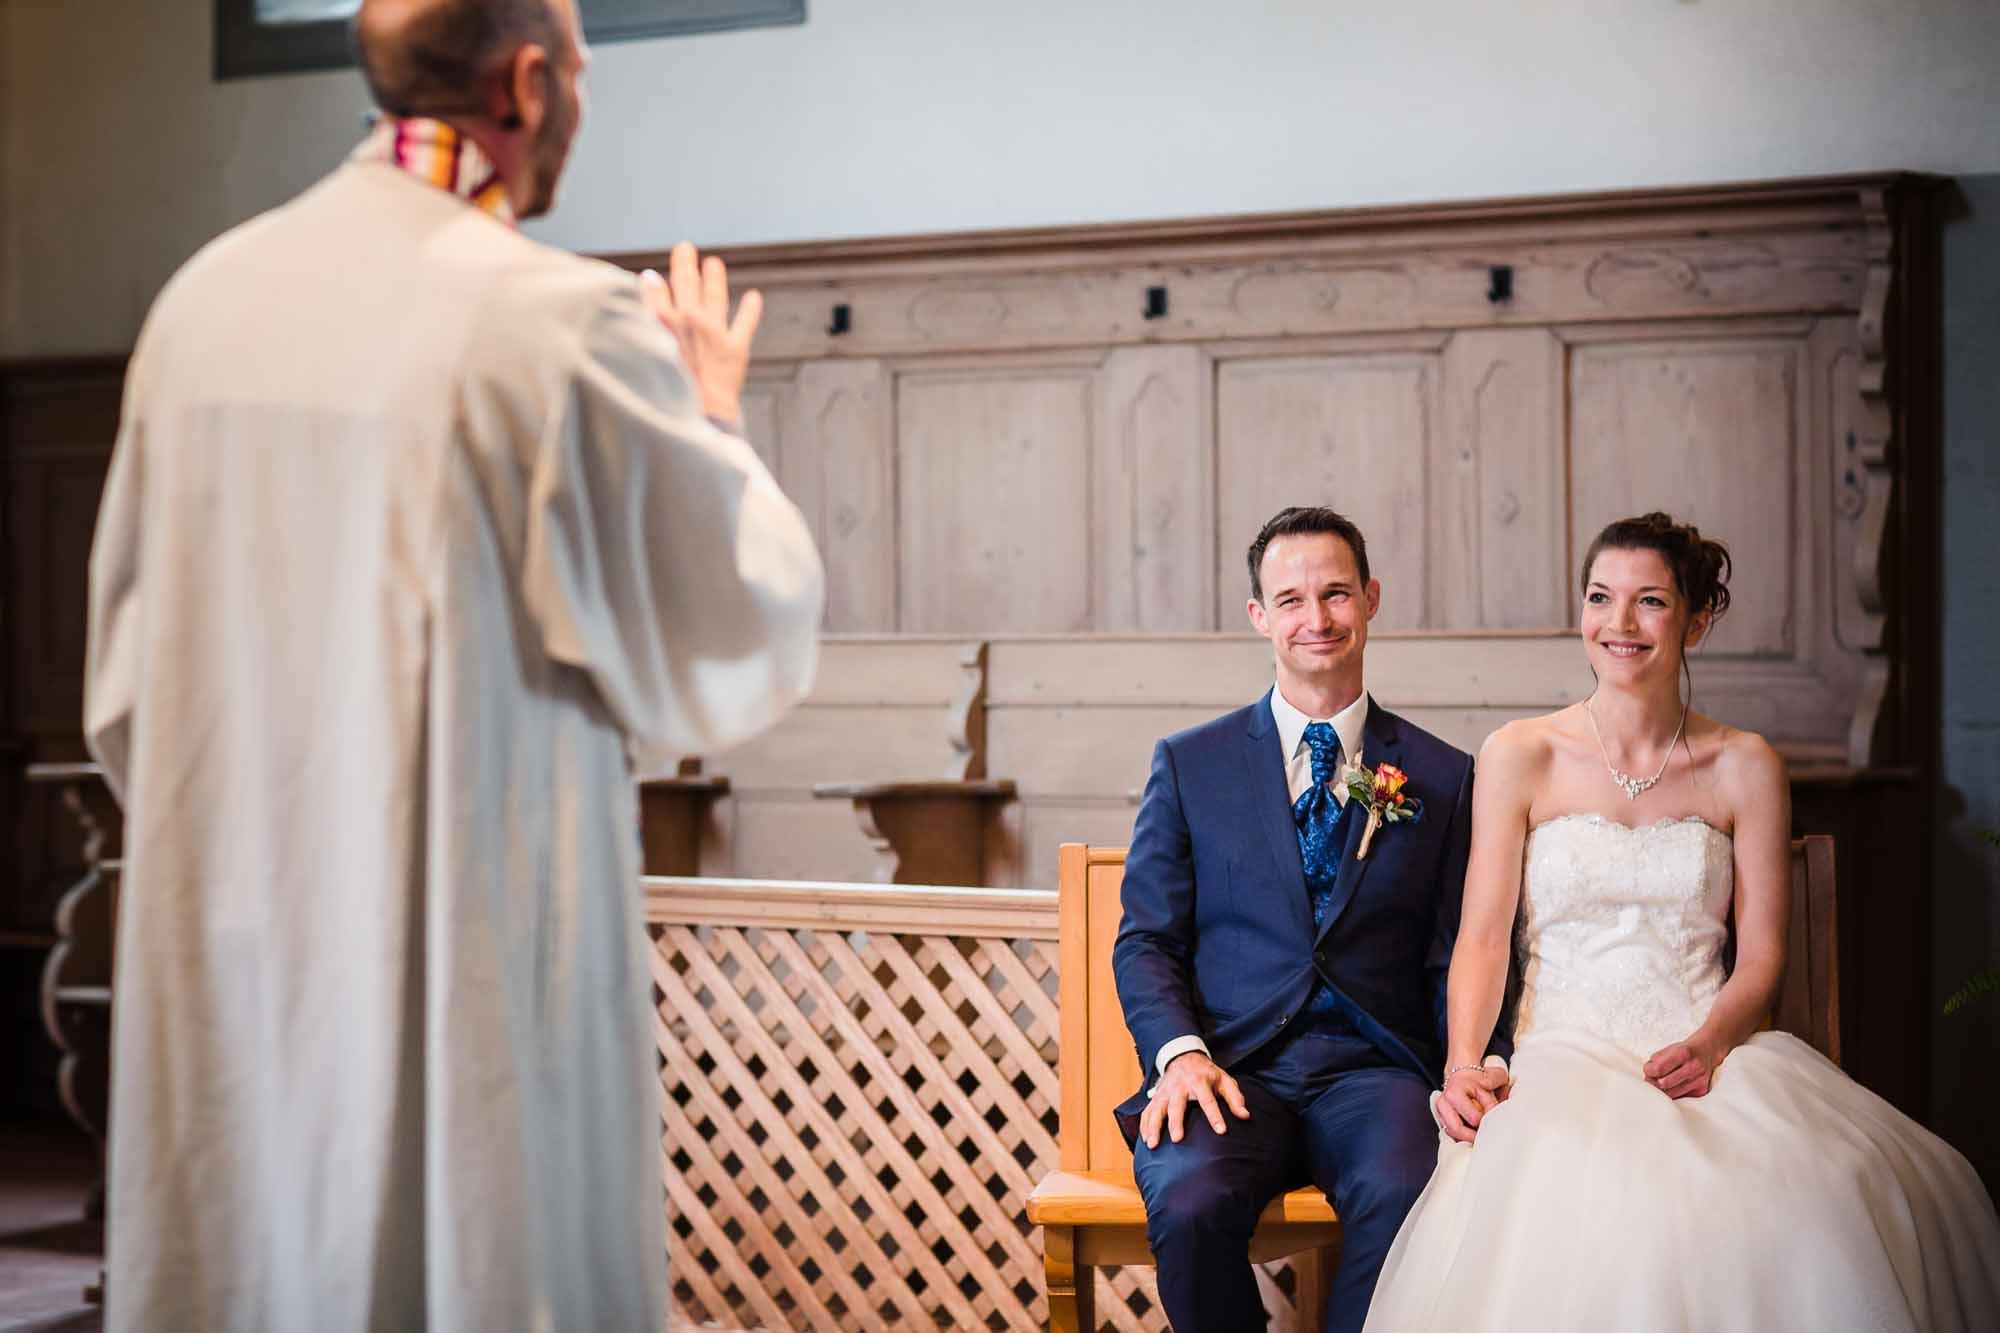 Pfarrer gibt Brautpaar Ratschlag